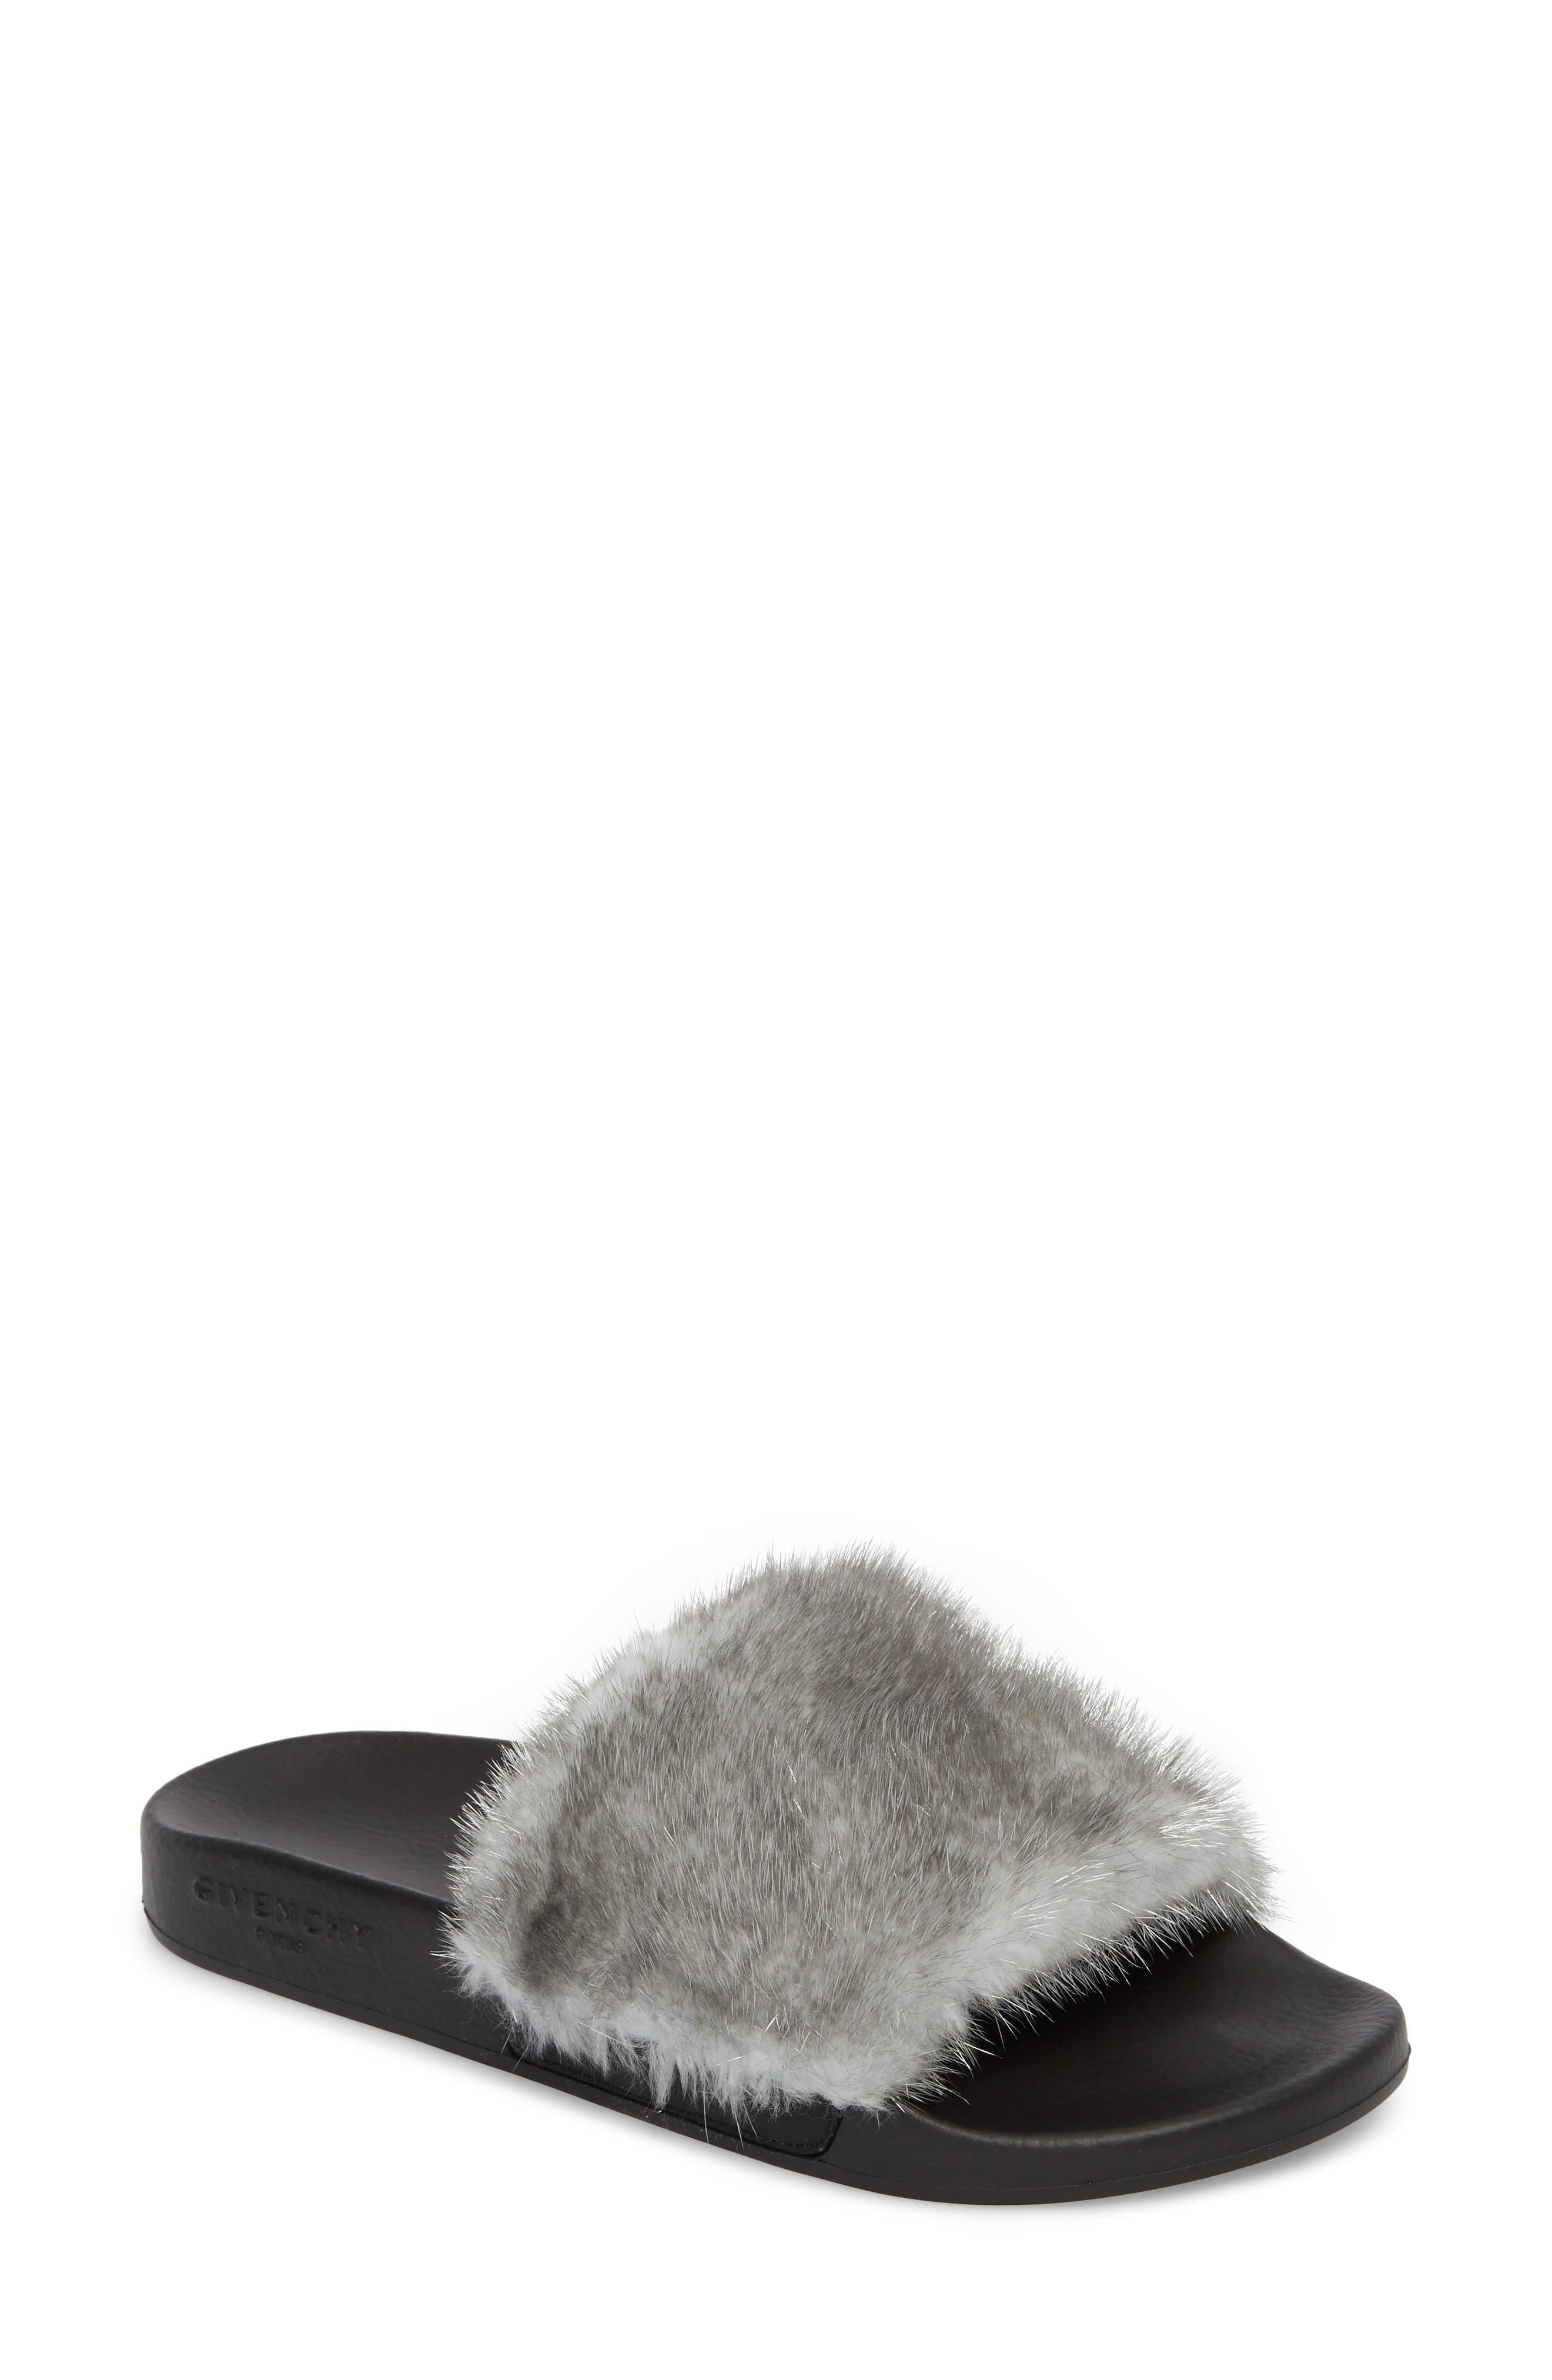 Genuine Mink Fur Slide Sandal,                             Main thumbnail 1, color,                             Silver